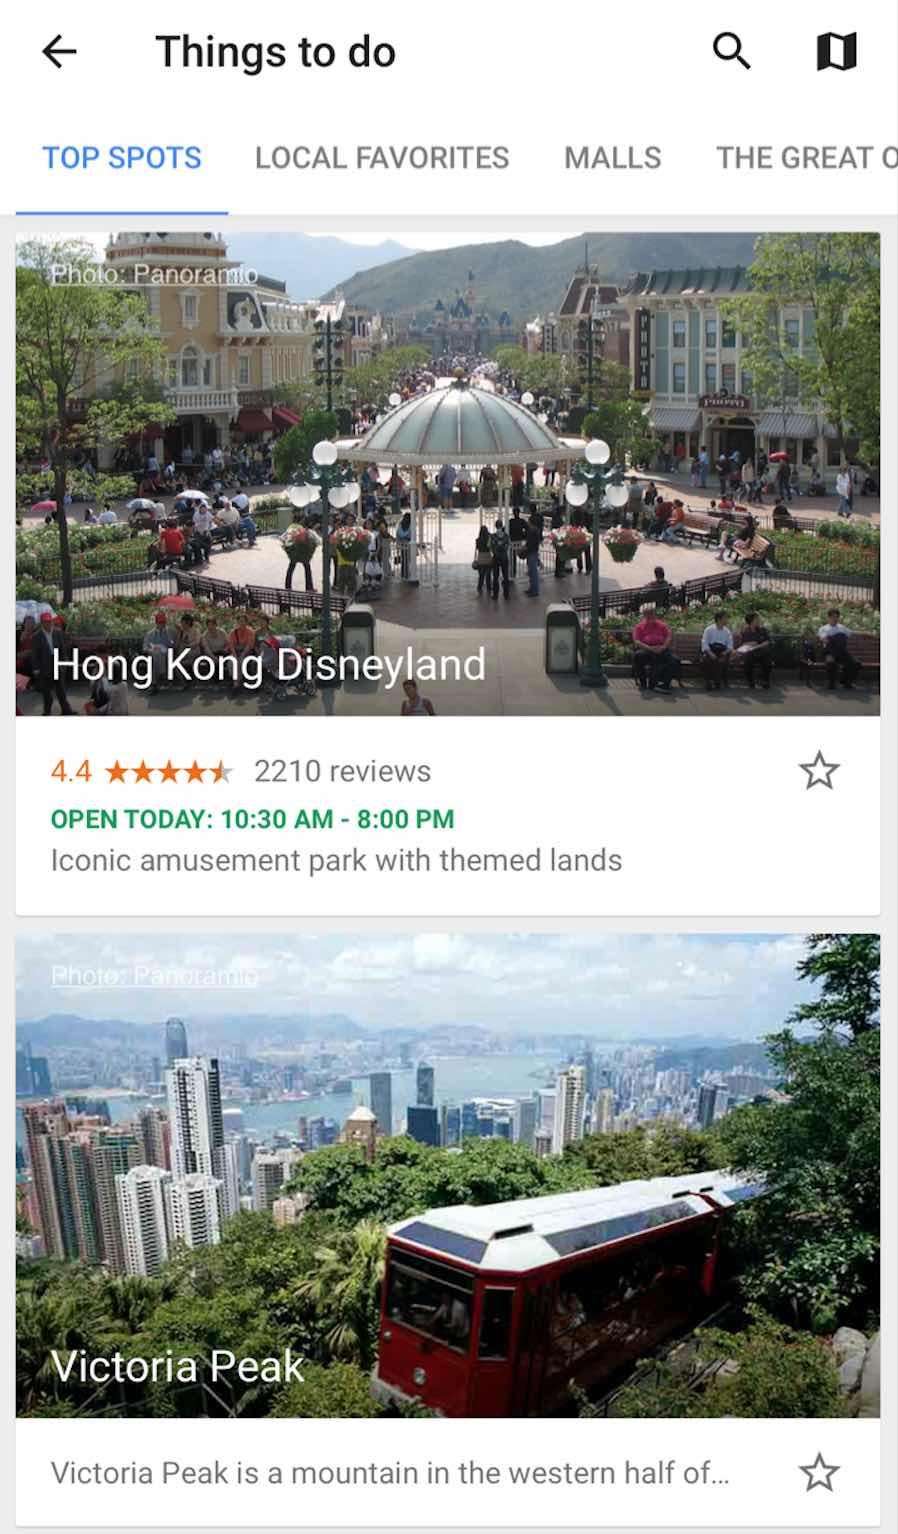 google-trips-top-attractions-aspirantsg